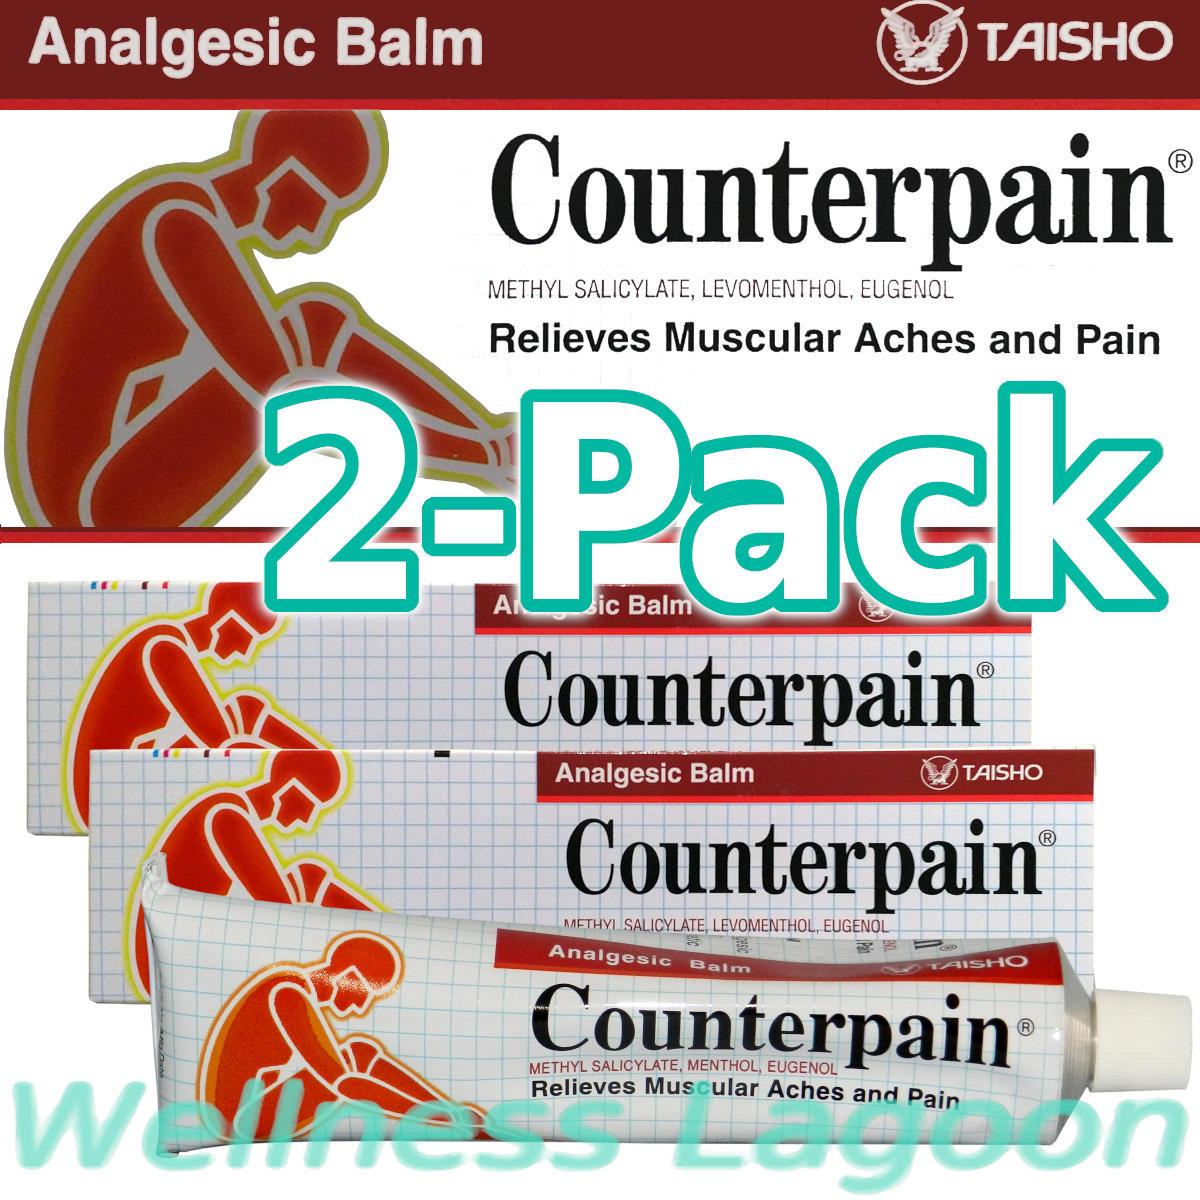 2x Taisho Counterpain Balm Red